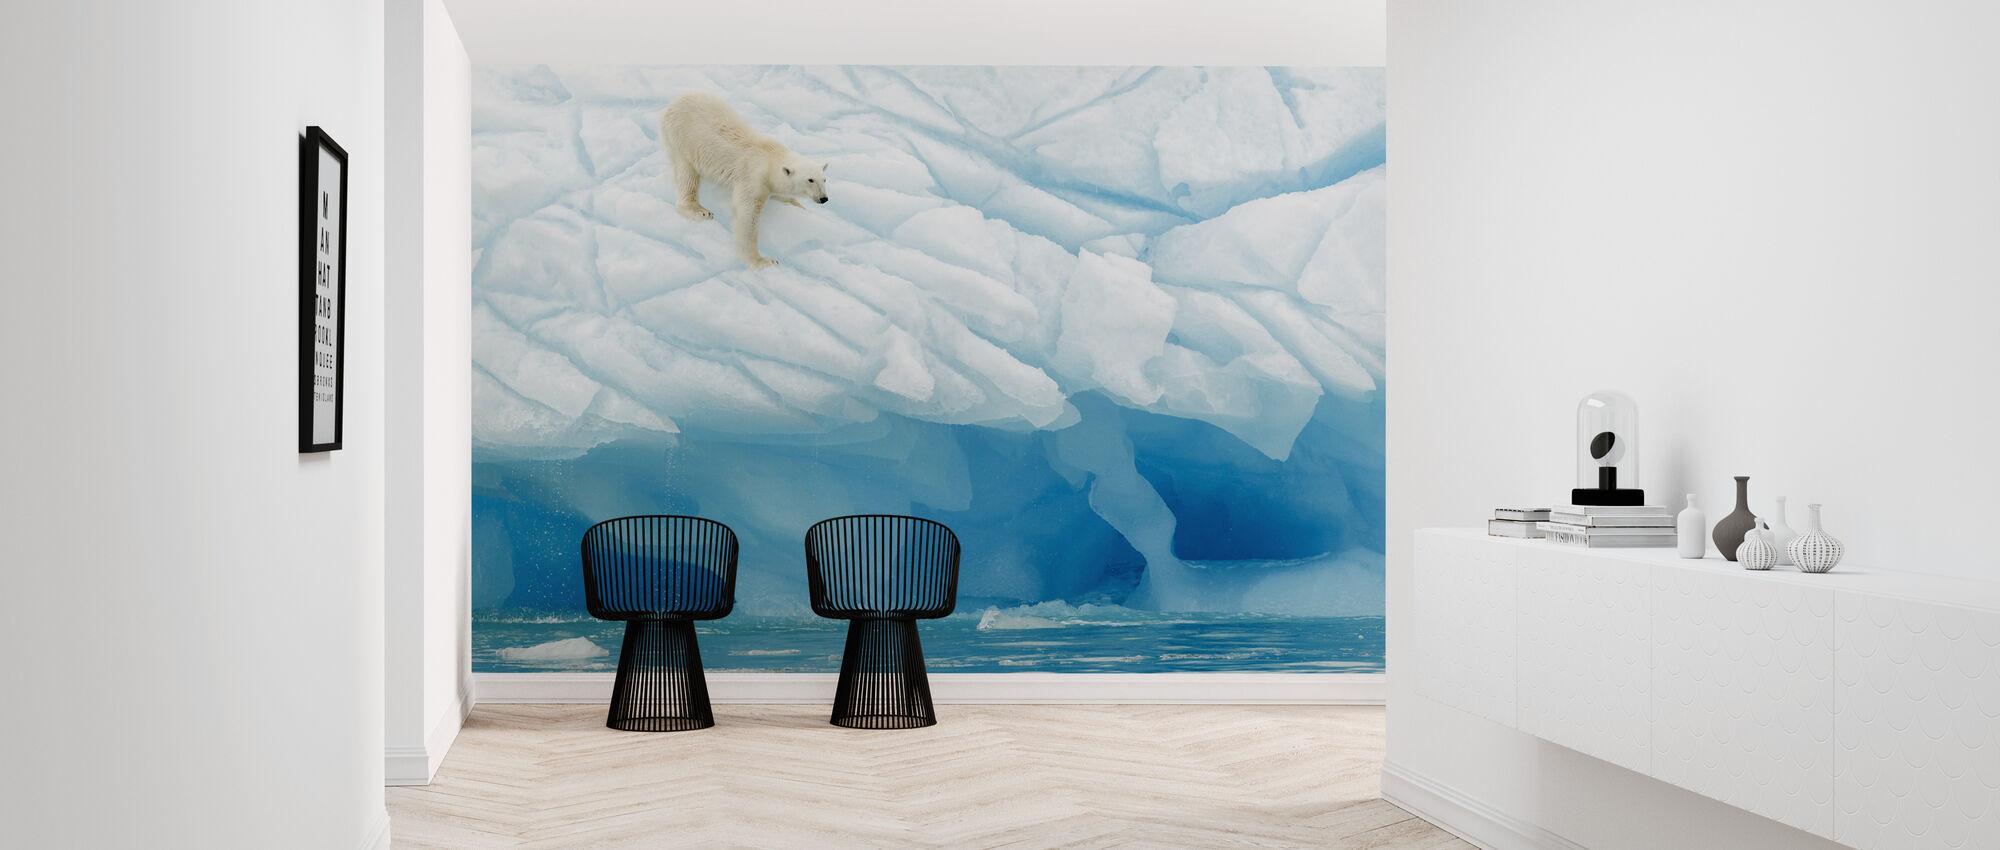 Leaning Polar Bear - Wallpaper - Hallway